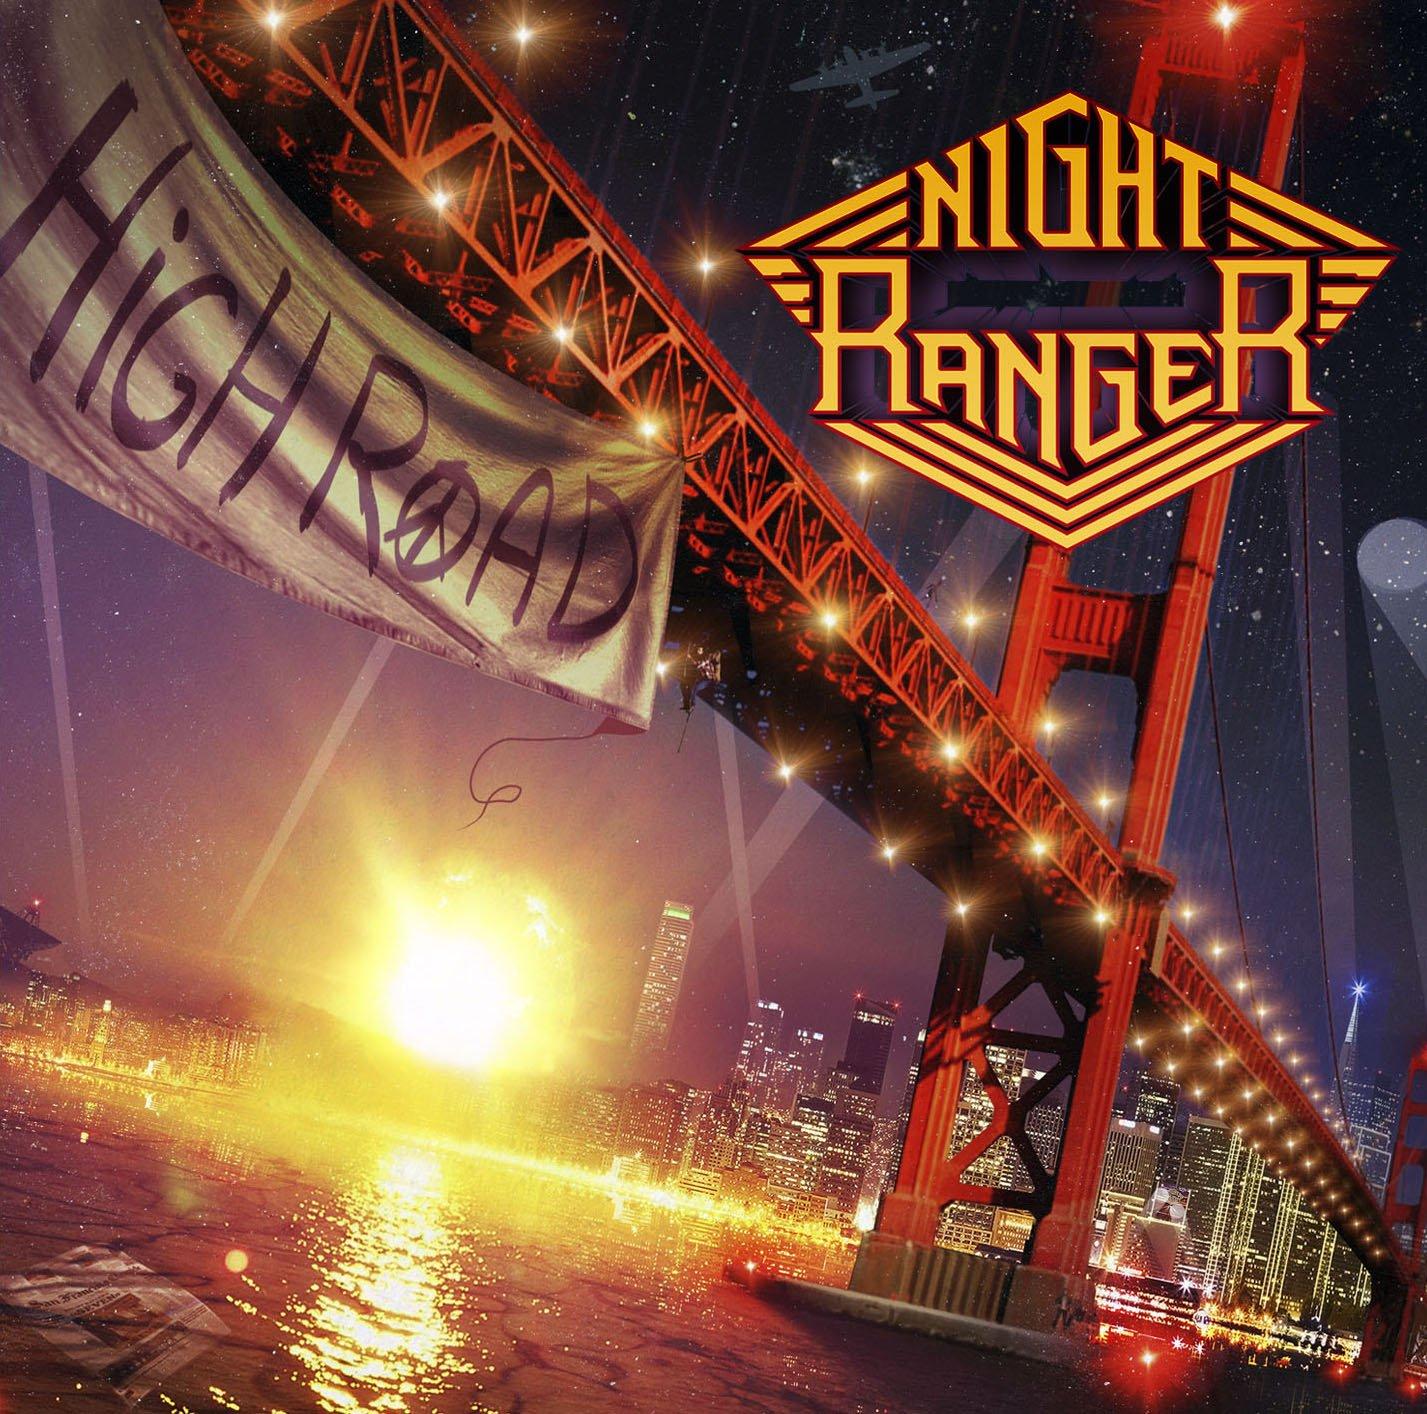 NIGHT RANGER - High Road 81dI41UM2dL._SL1427_